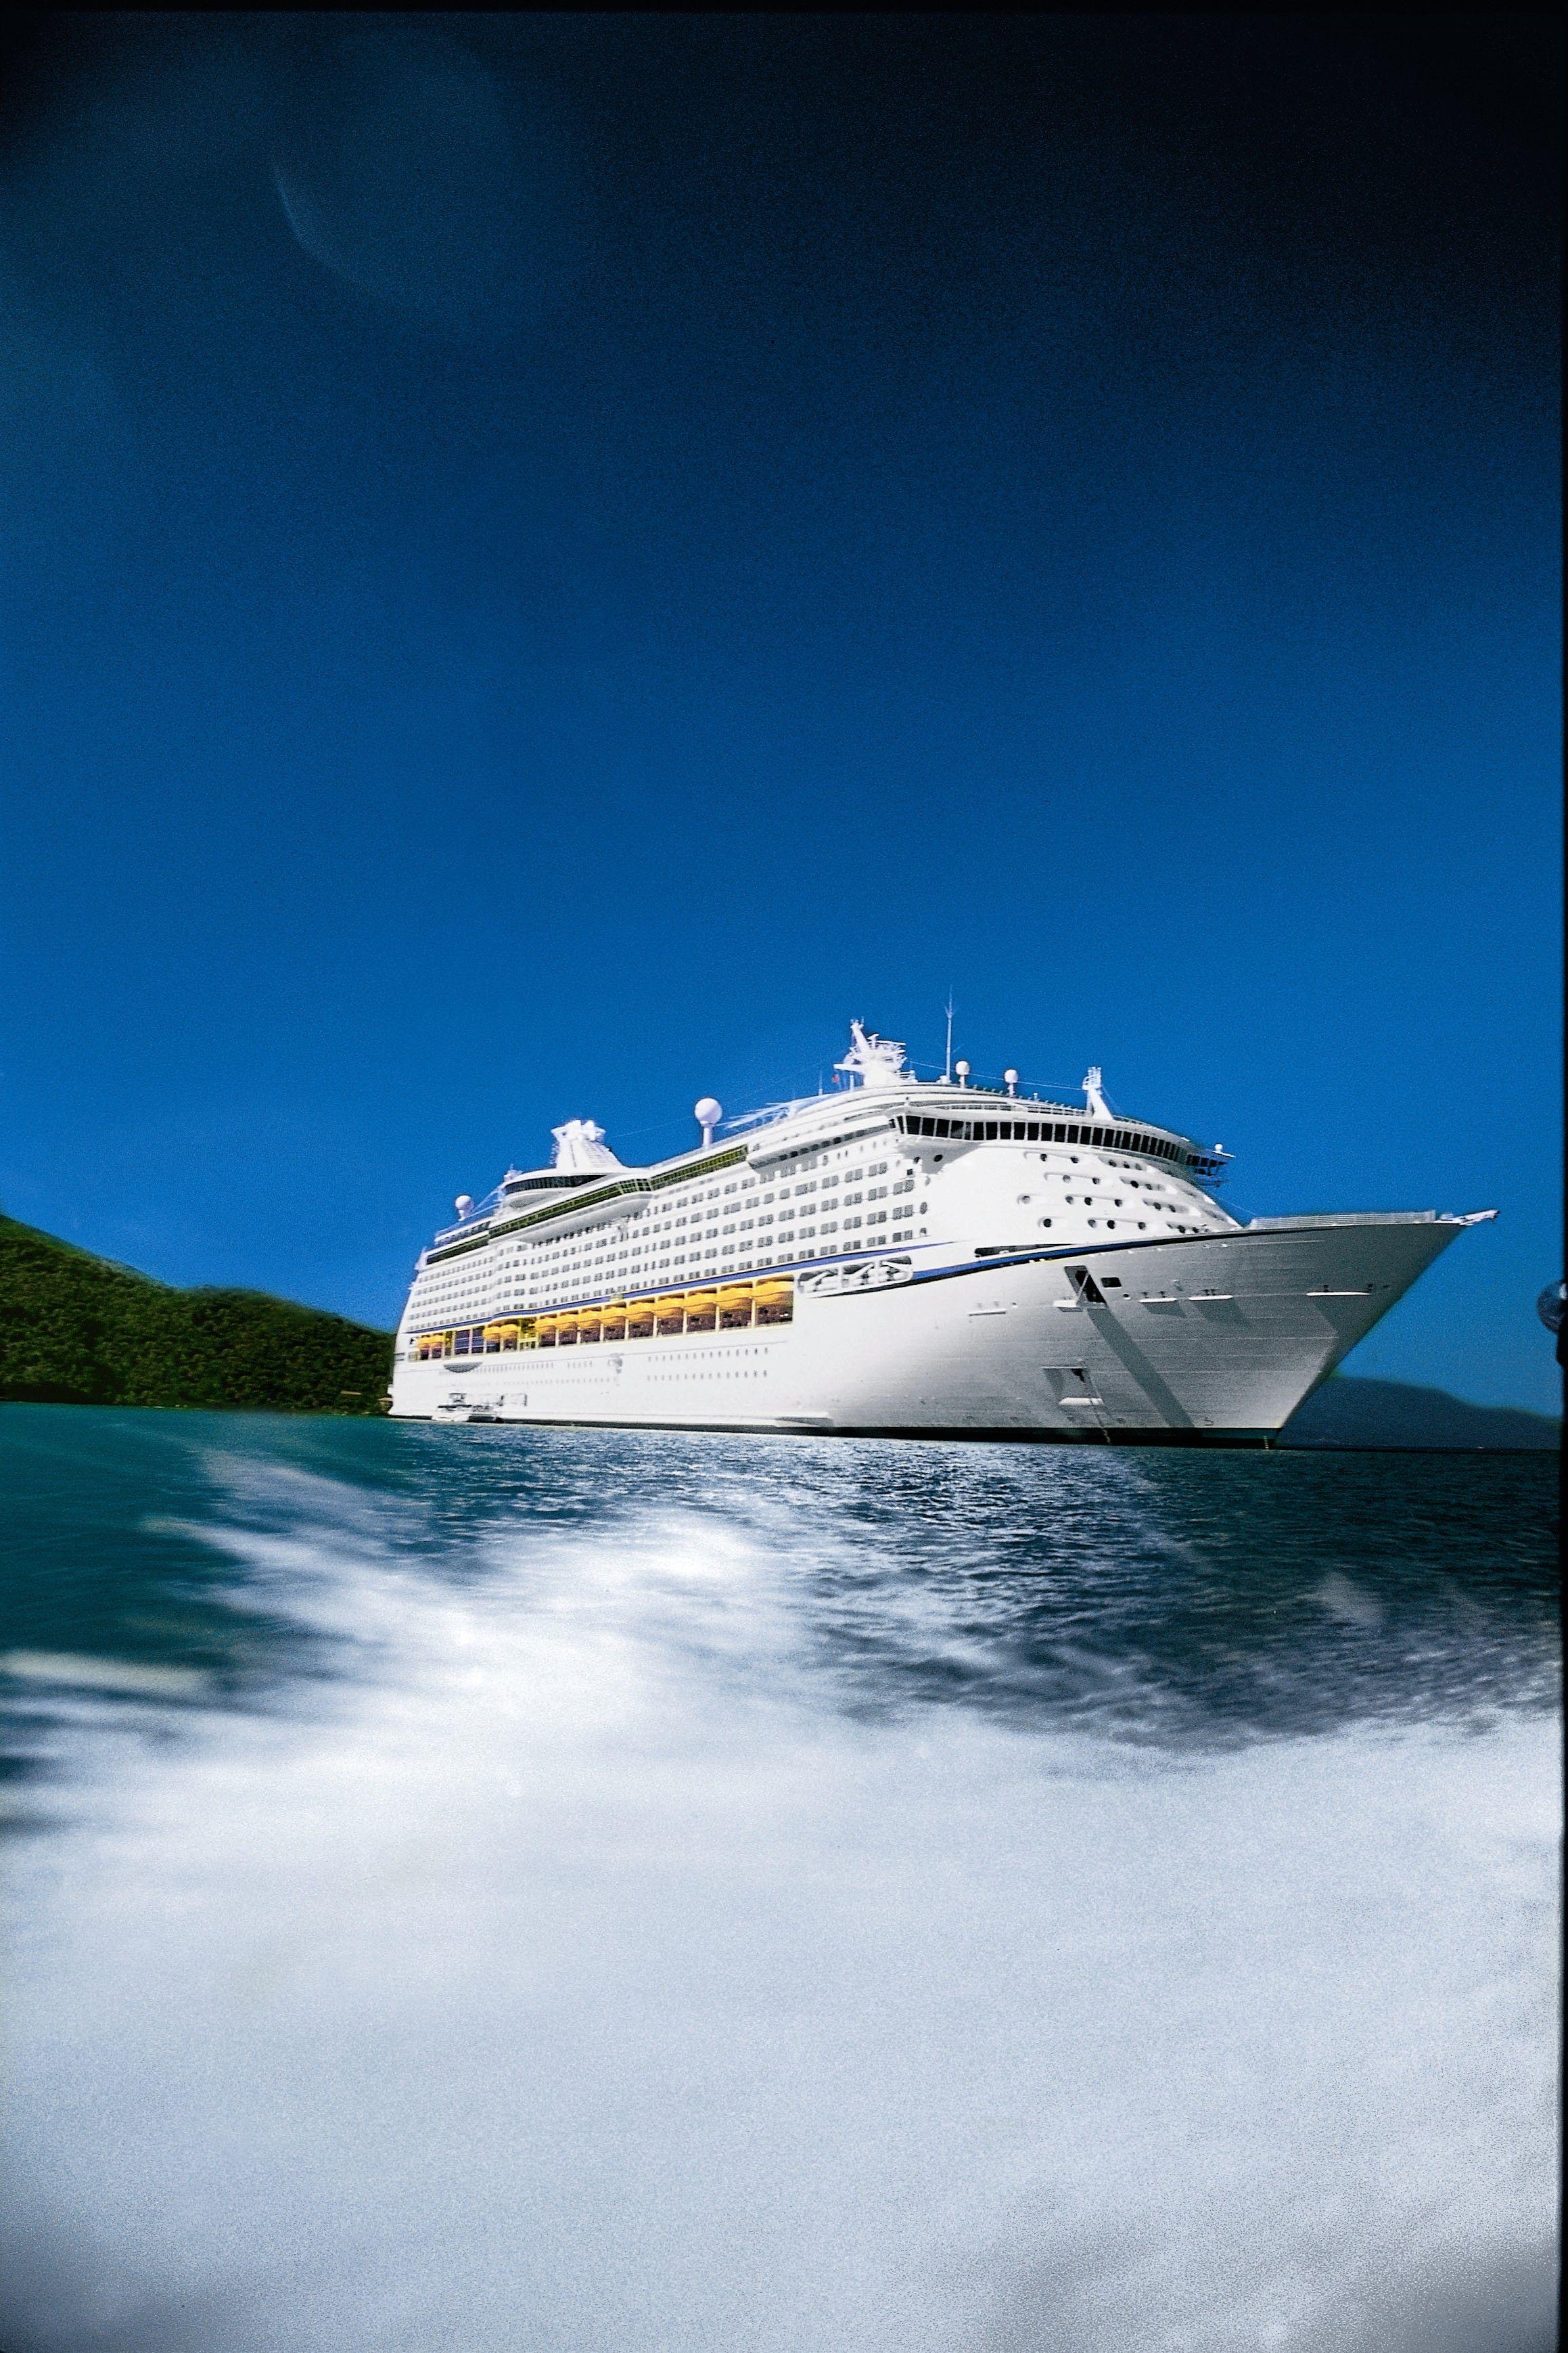 Royal Caribbean International Voyager Luxury cruise